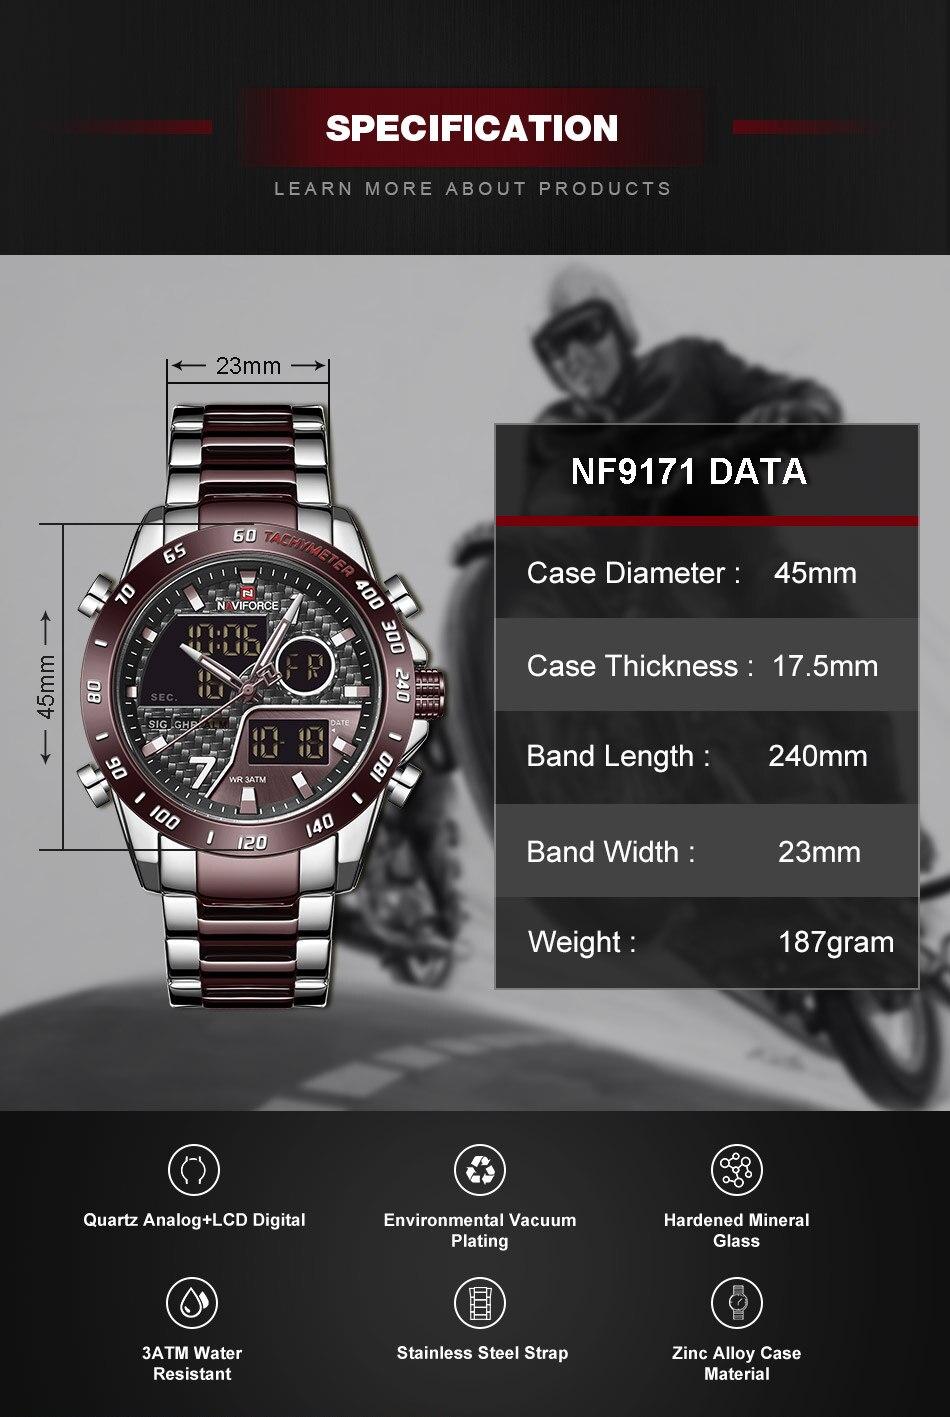 Hd9c3737b3071471fadc6d65d2a732c47a NAVIFORCE Men Digital Watch LED Sport Military Mens Quartz Wristwatch Male Luminous Waterproof Clock Watches Relogio Masculino